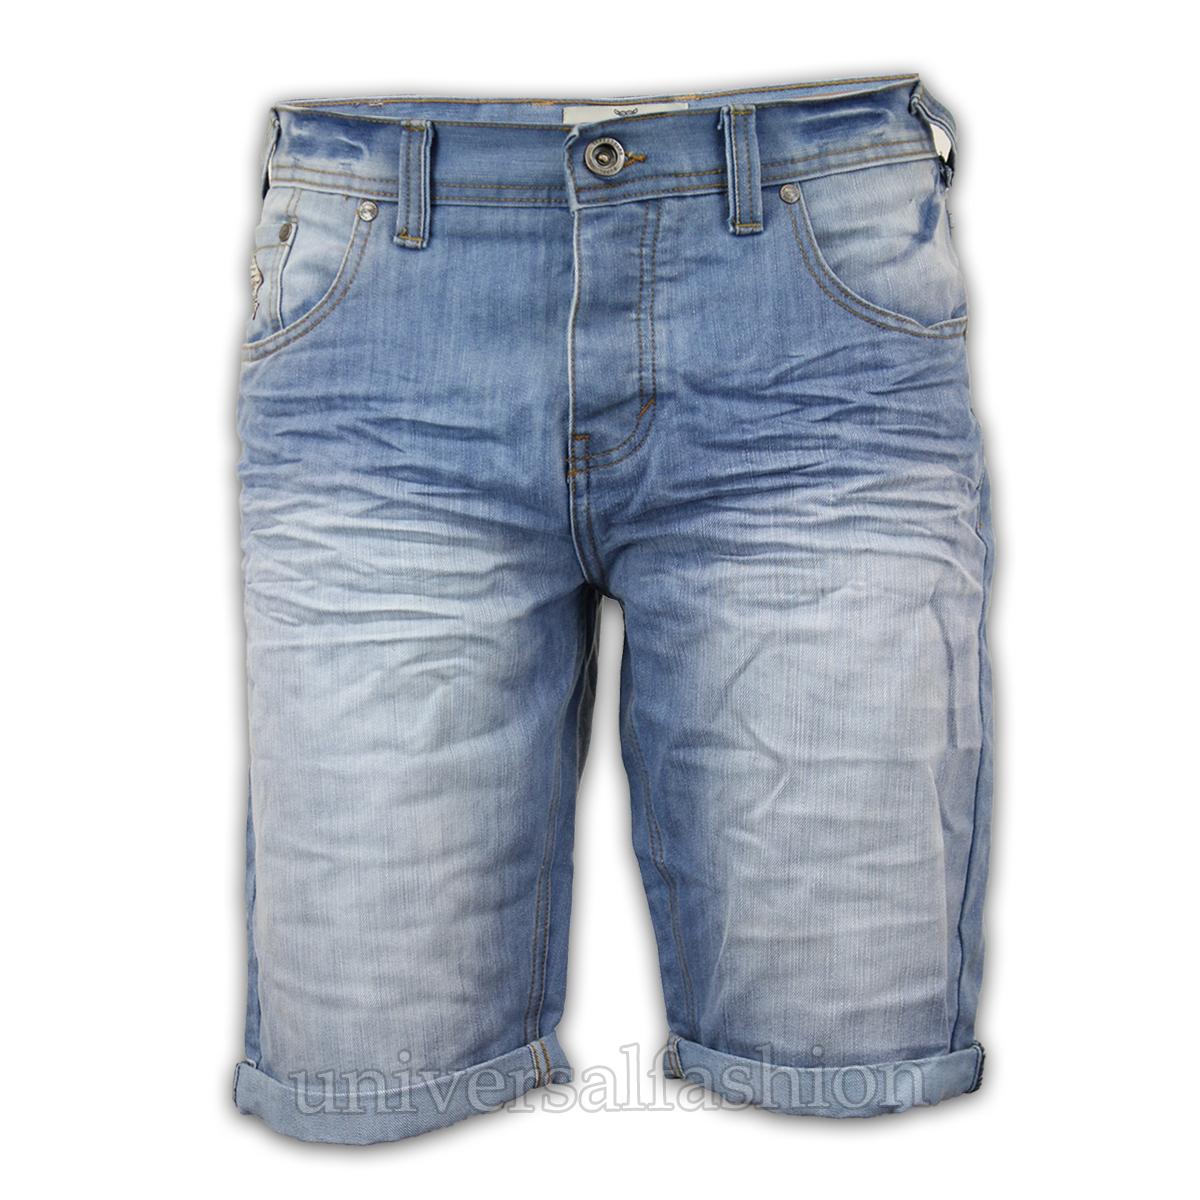 Mens Denim Shorts Threadbare Knee Length Jeans Bottoms Ripped ...